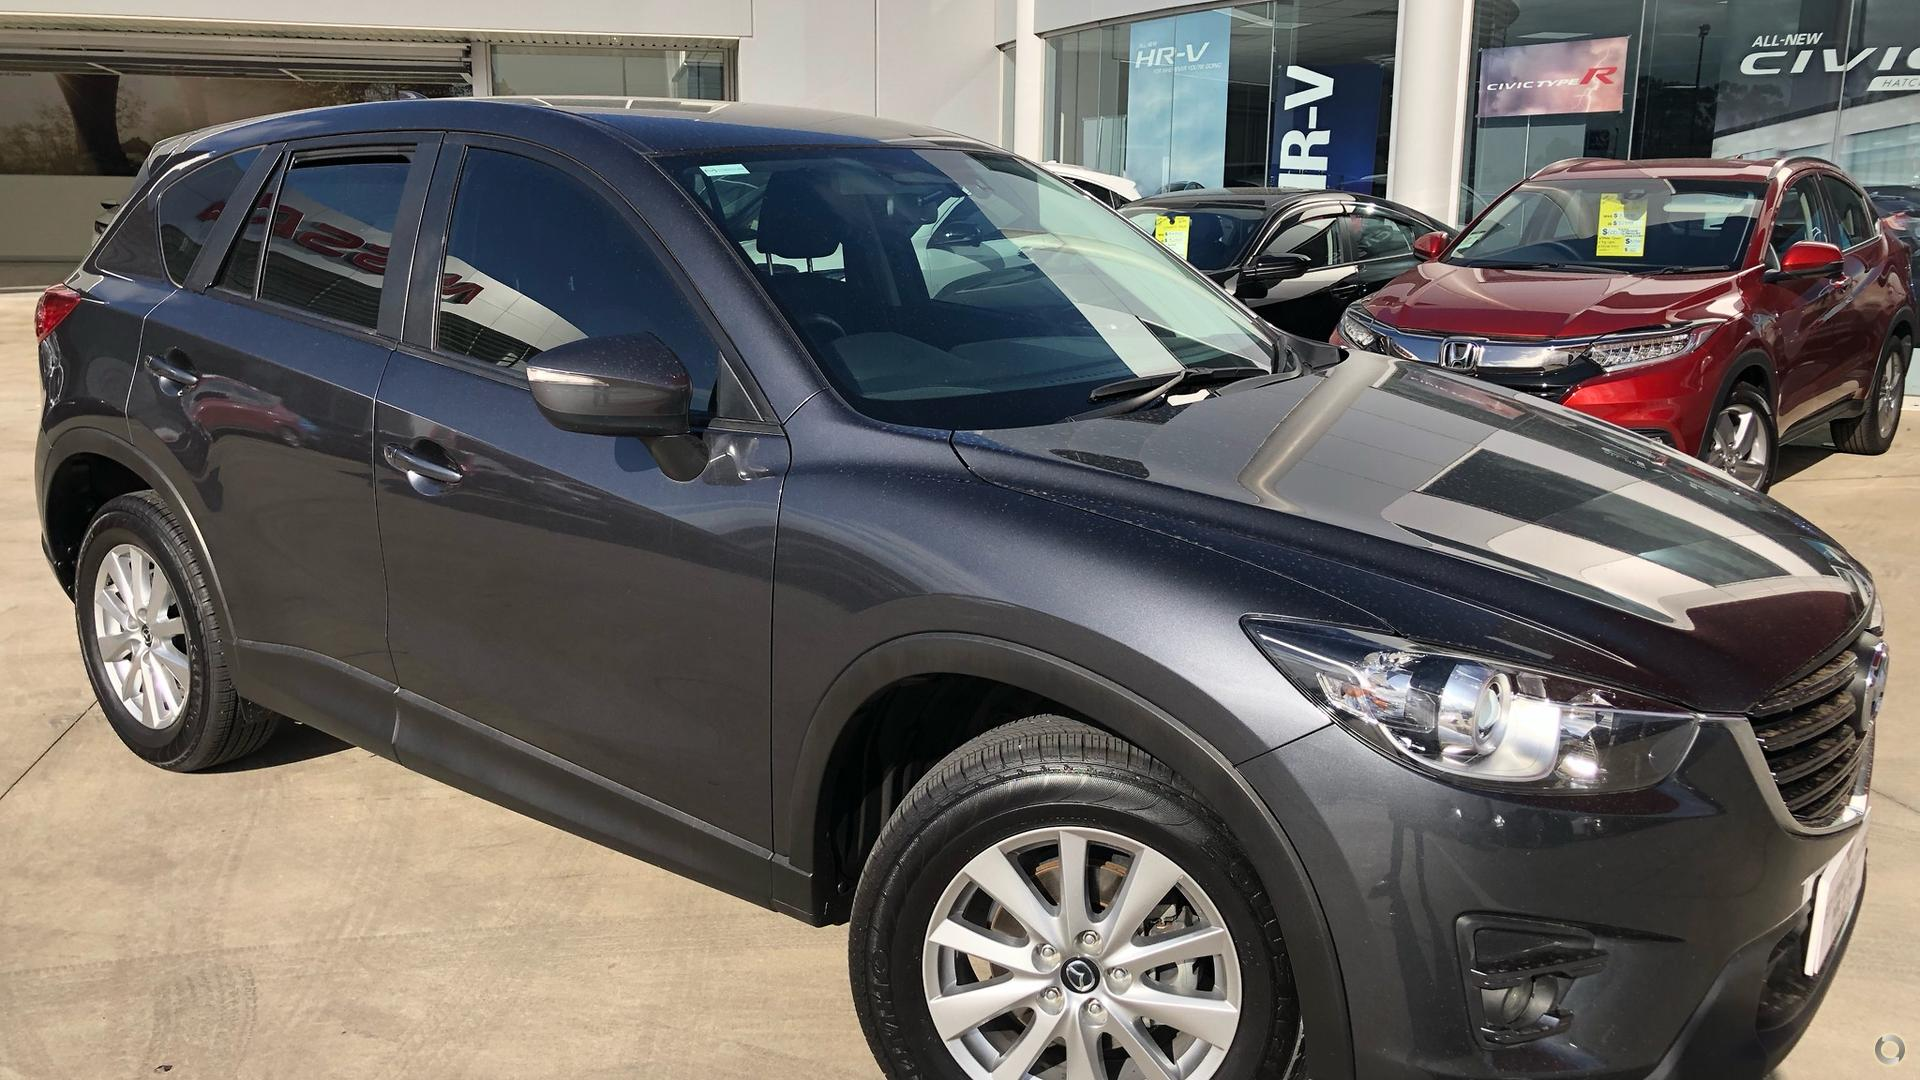 2014 Mazda Cx-5 Maxx Sport KE Series 2